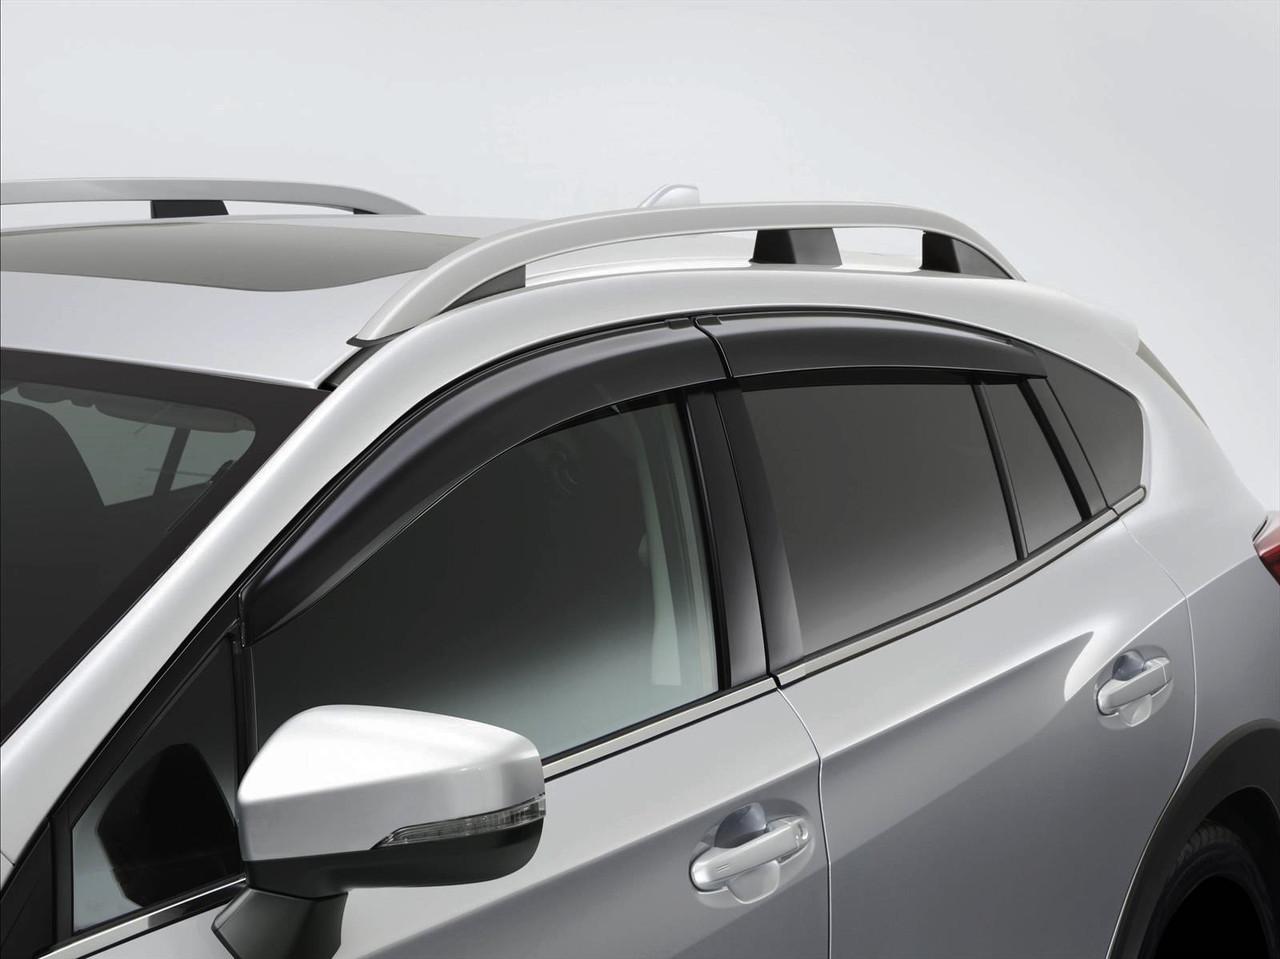 Дефлекторы окон (ветровики) SUZUKI SX4 (hatchback) 2006 - 2013  (ANV)